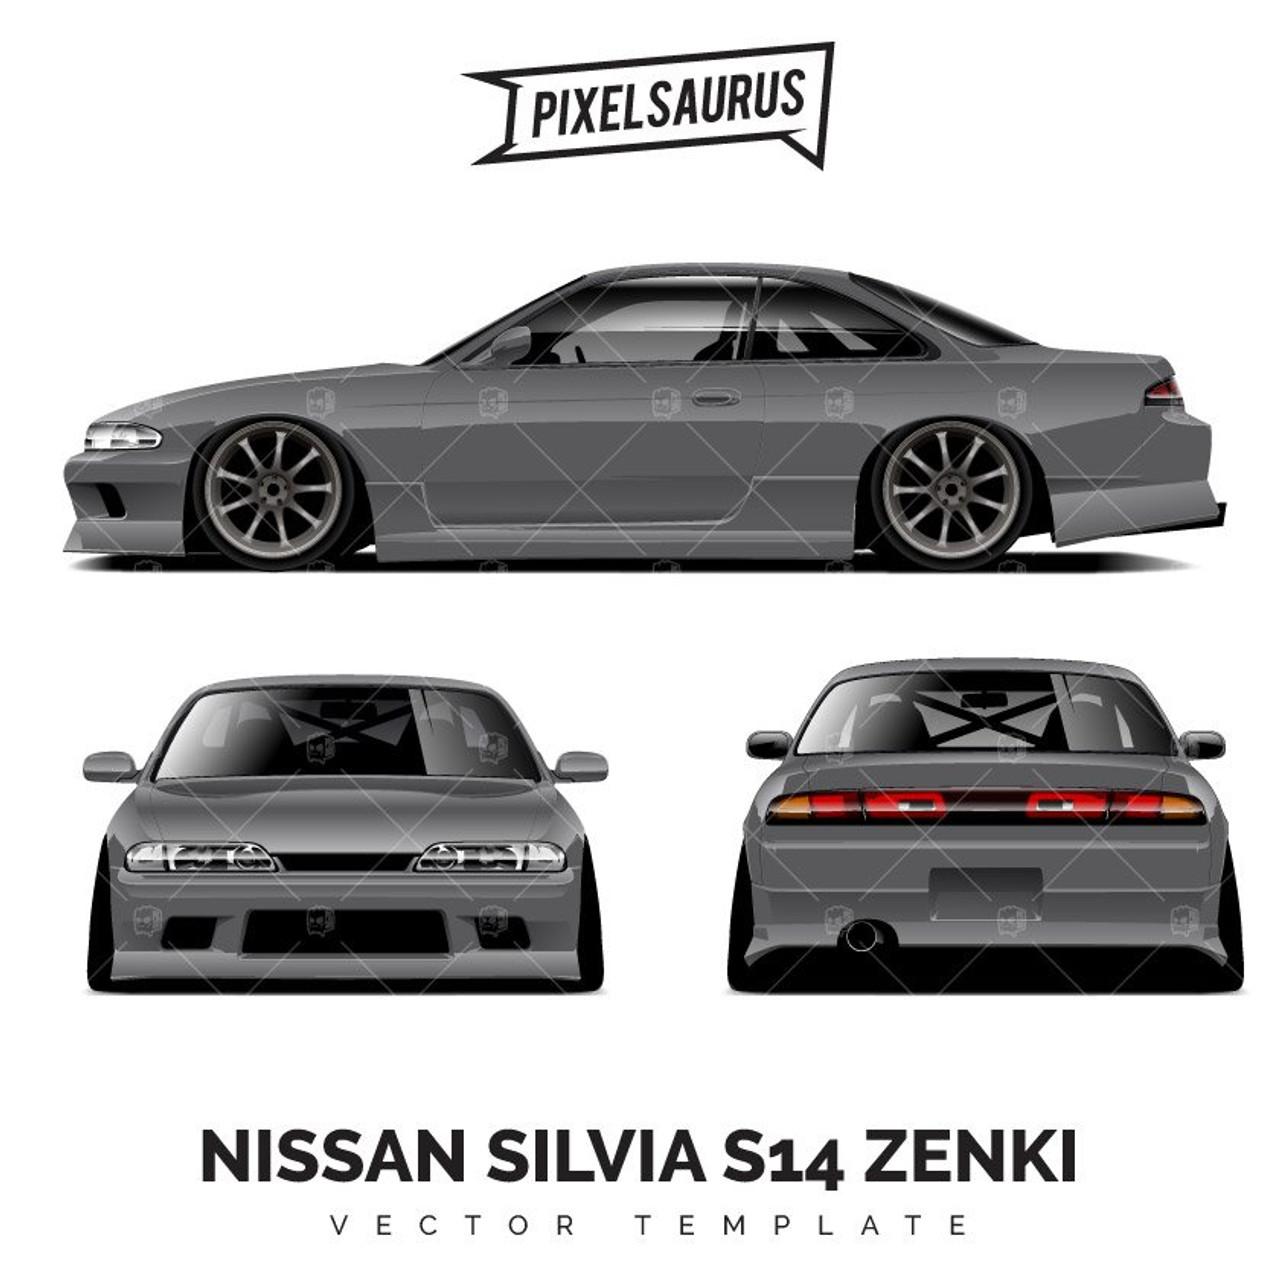 Nissan Silvia S14 Zenki Drift Car Vector Template Pixelsaurus